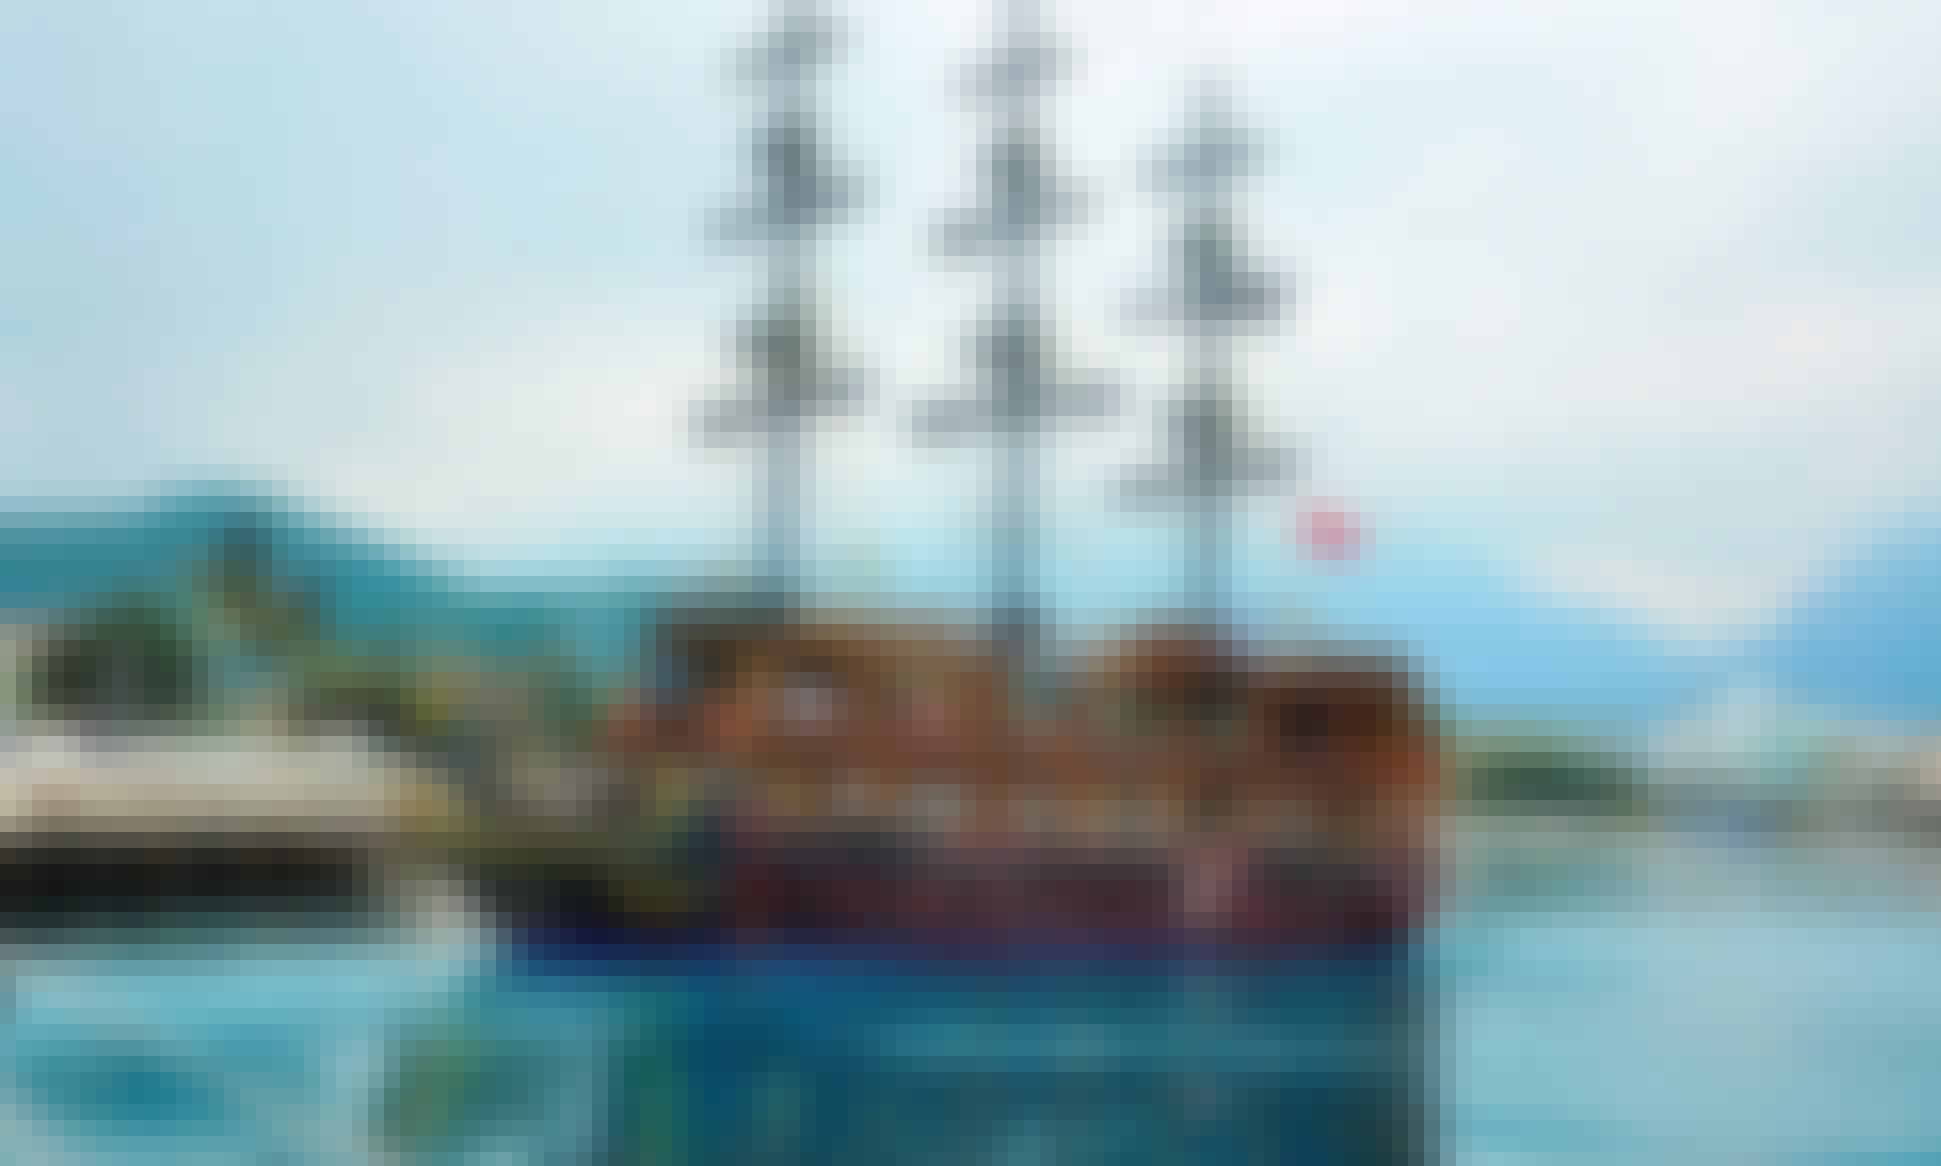 Enjoy Pirate Boat Tours in Antalya, Turkey